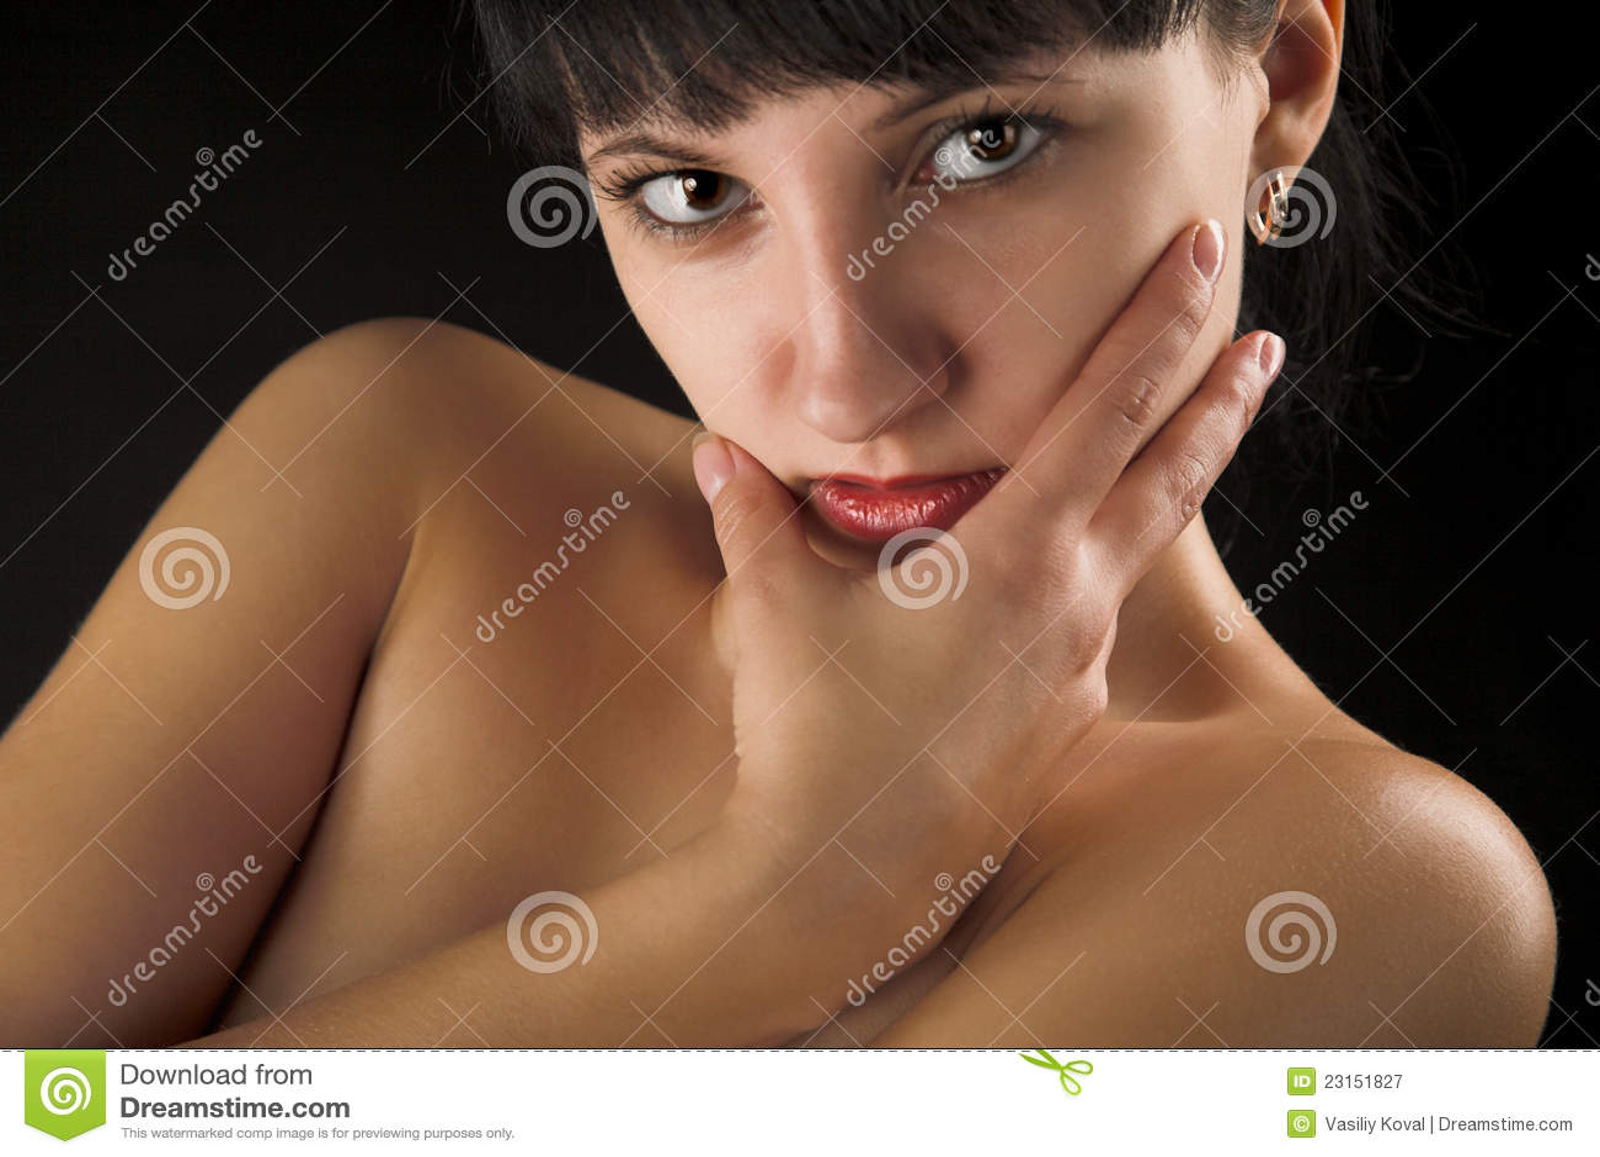 qruiser m kvinnor nakna